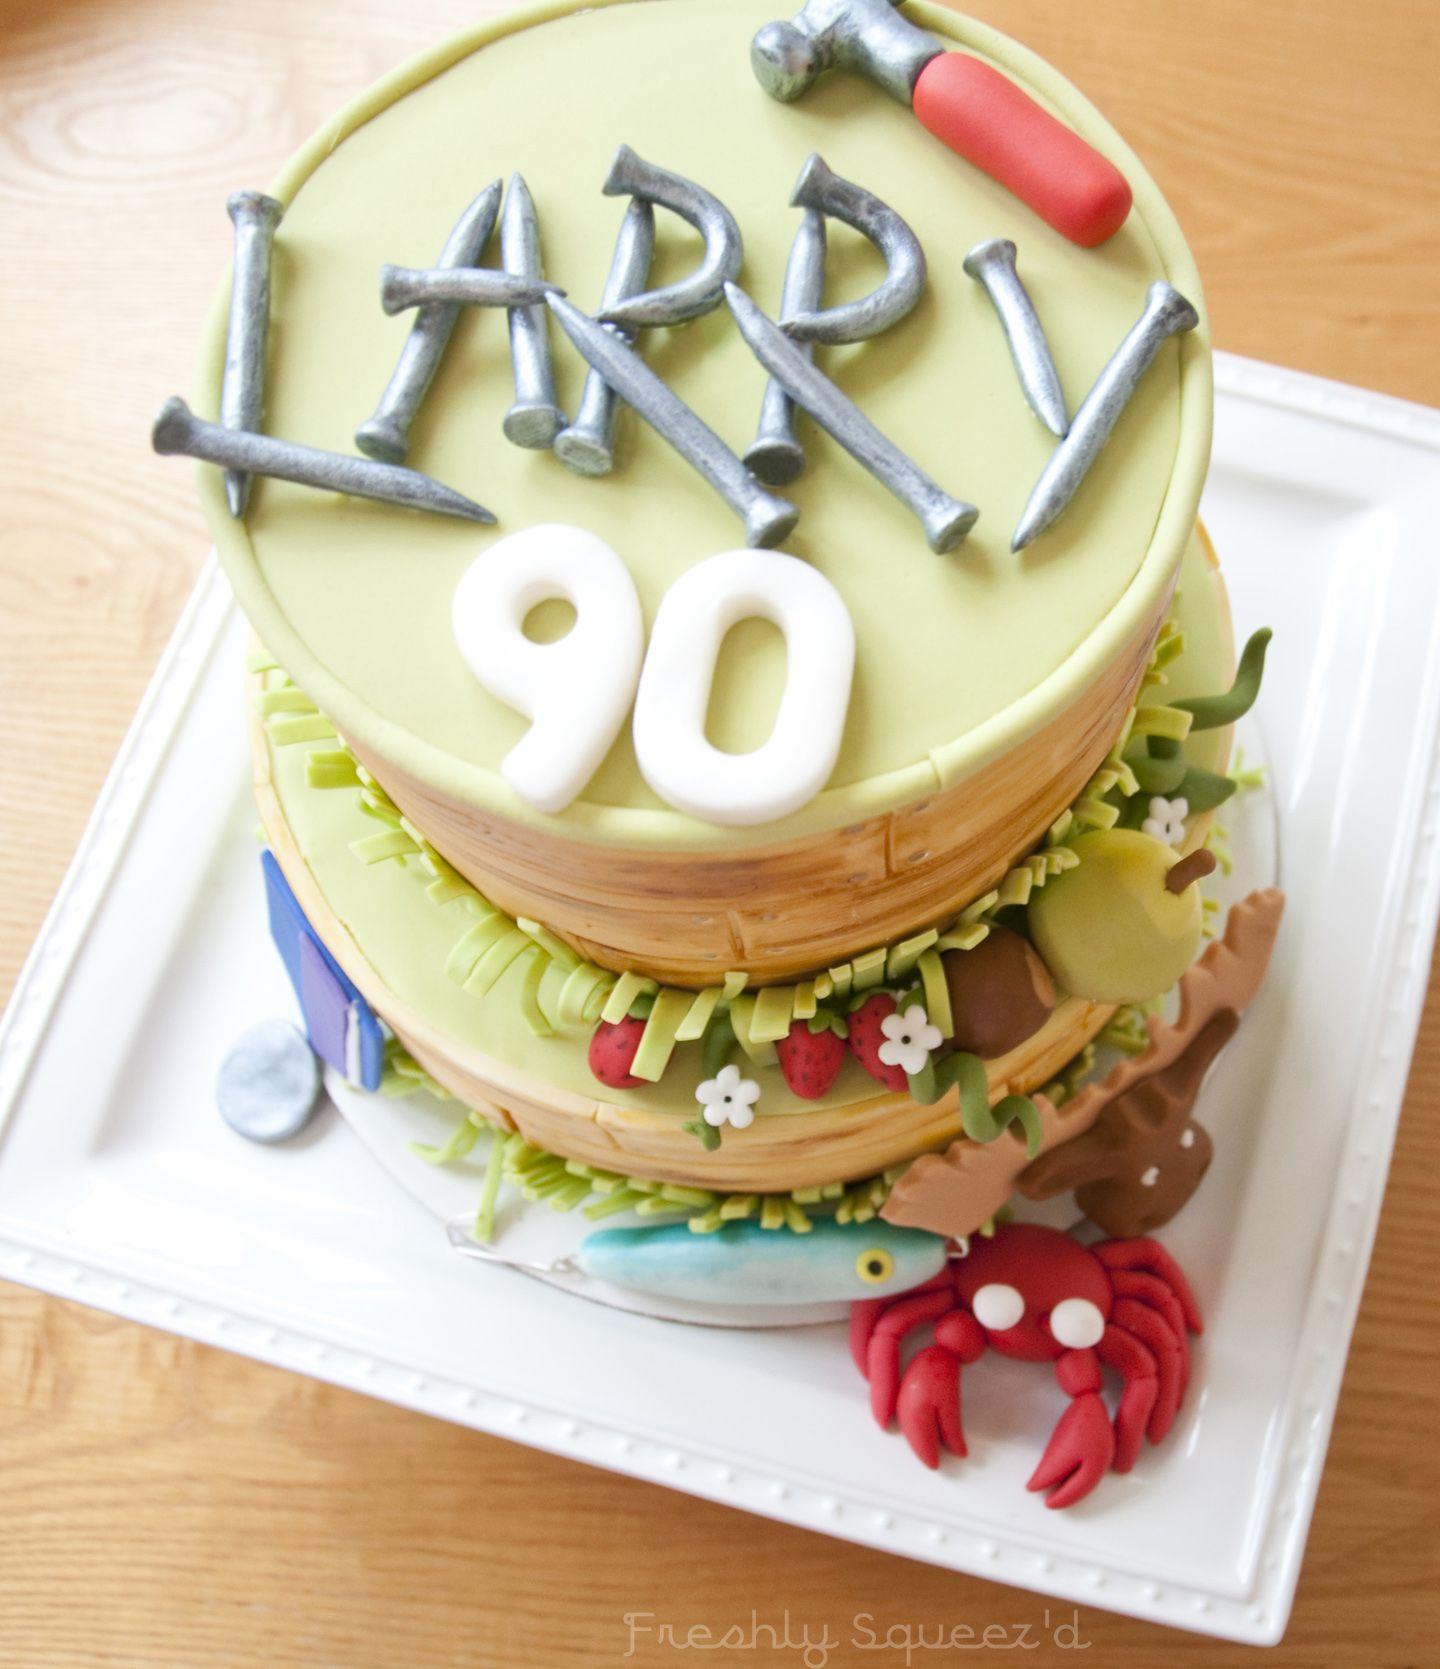 A Chocolate And Hazelnut 90th Birthday Cake For My Grandpa